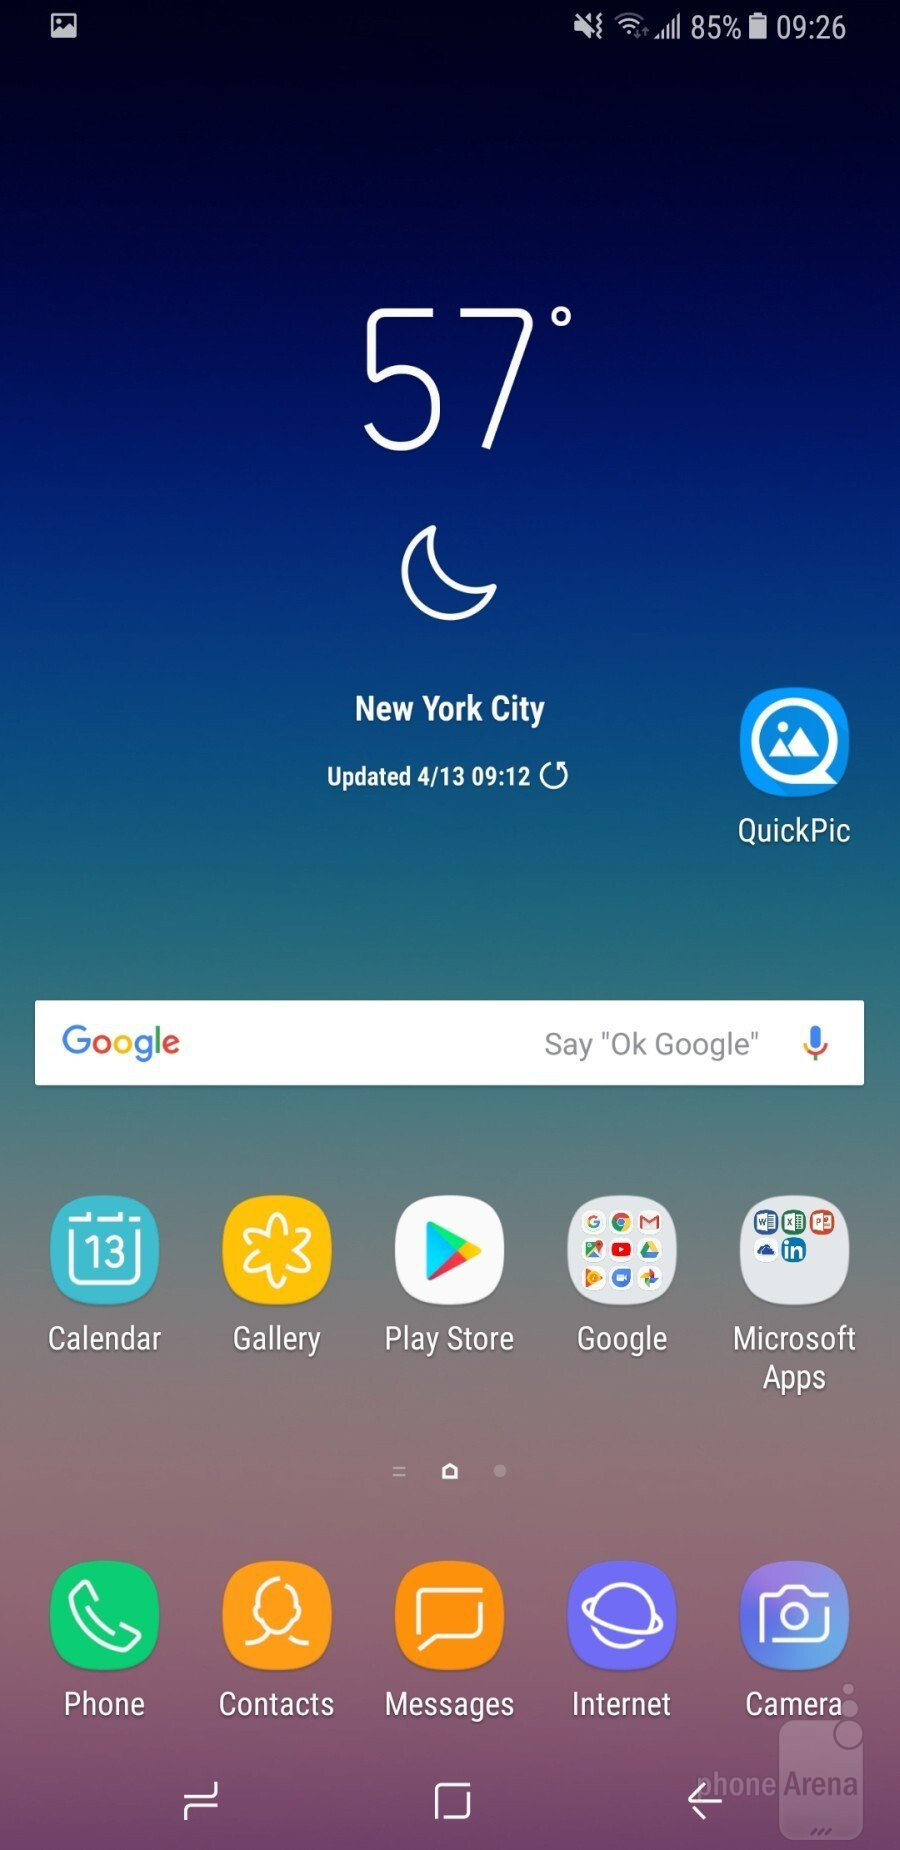 Samsung Galaxy A8+ (2018) Review - PhoneArena